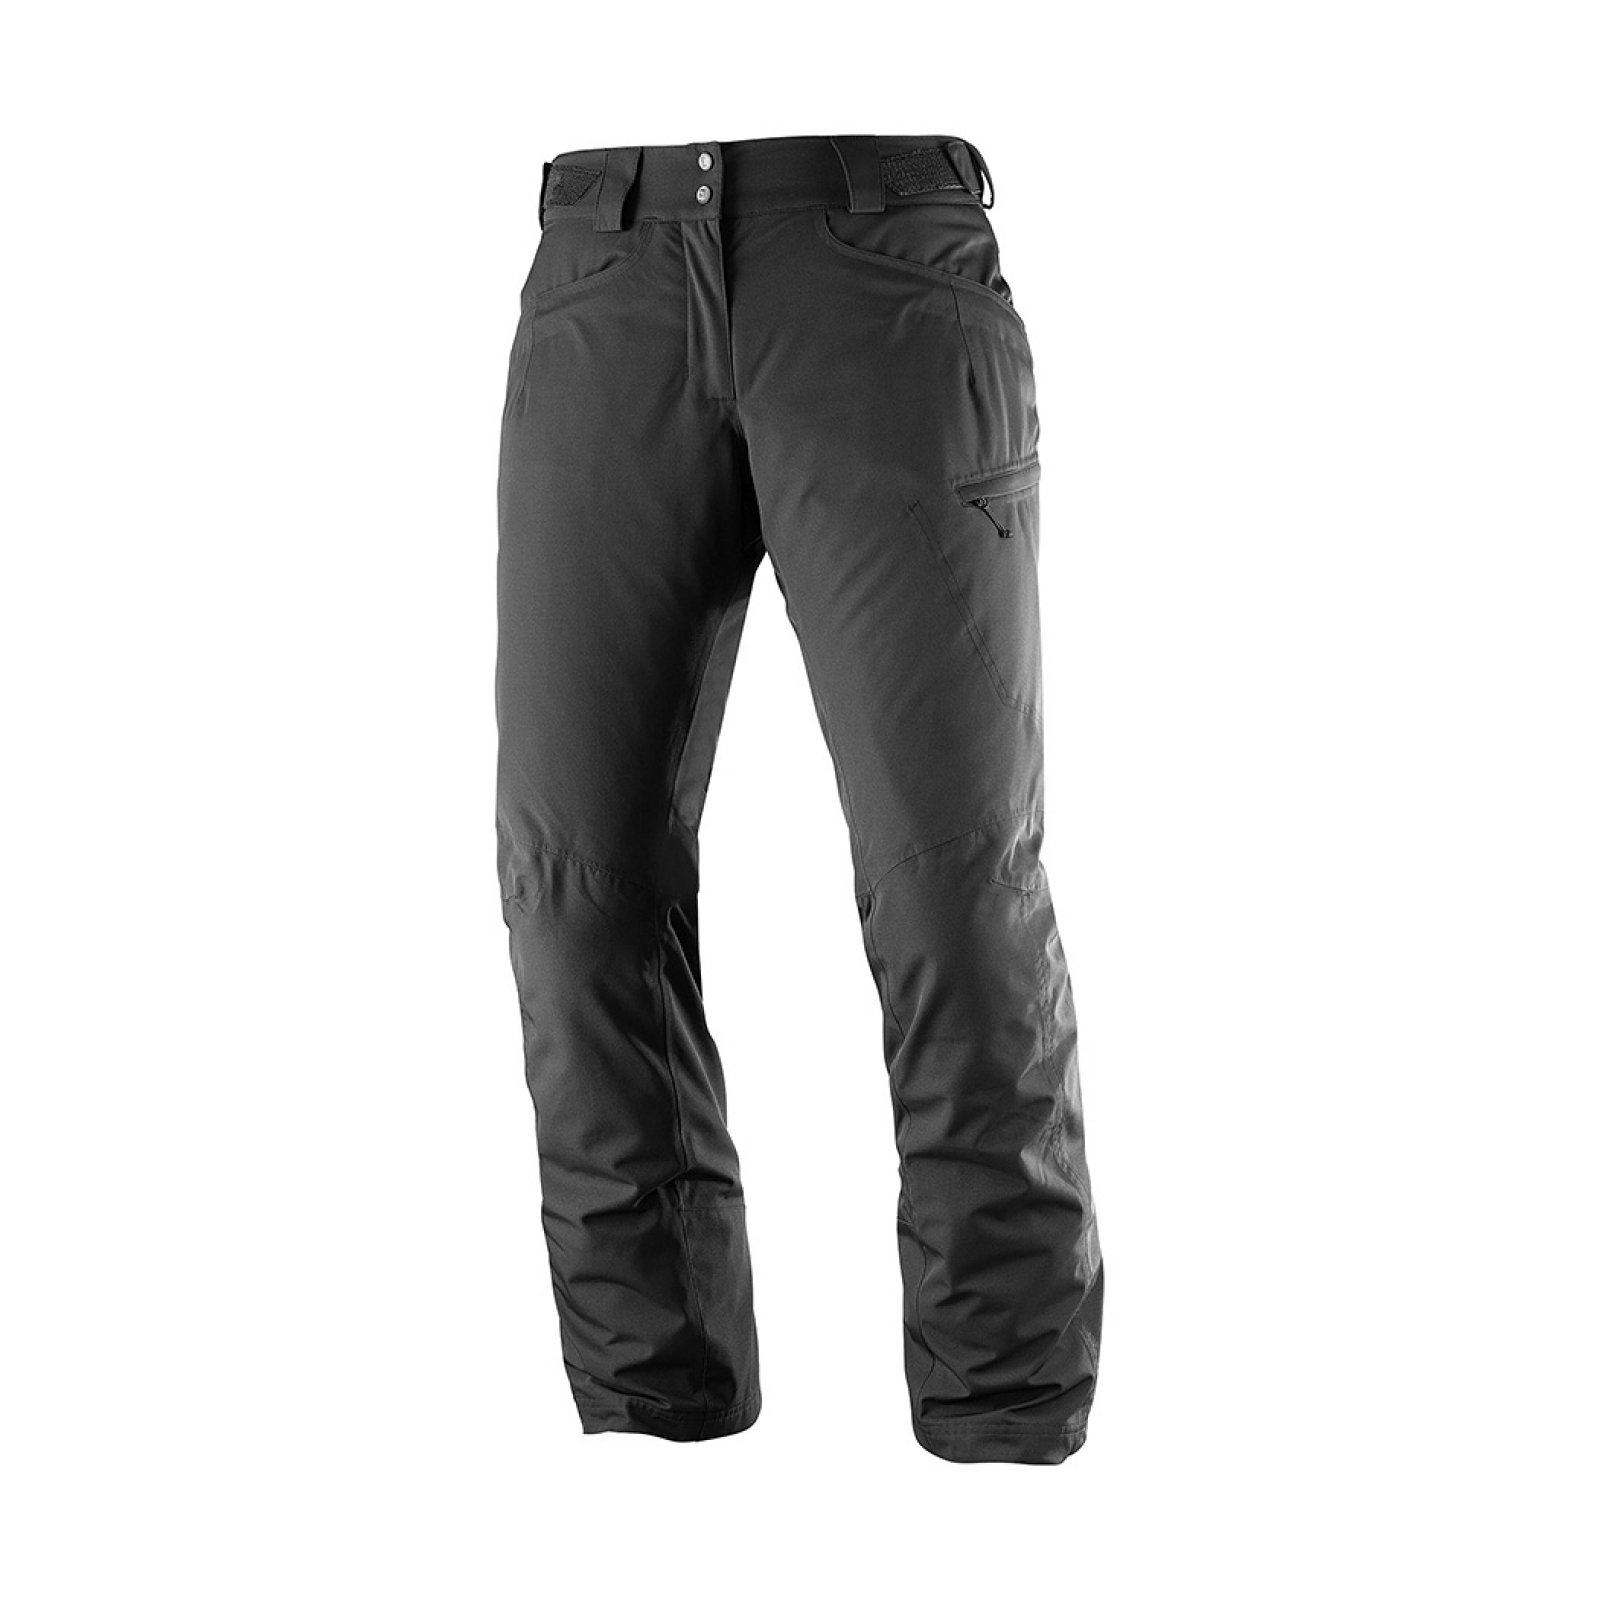 Lyžařské kalhoty Salomon Fantasy Pant W black heather L39889600 ... bbffdaebc4